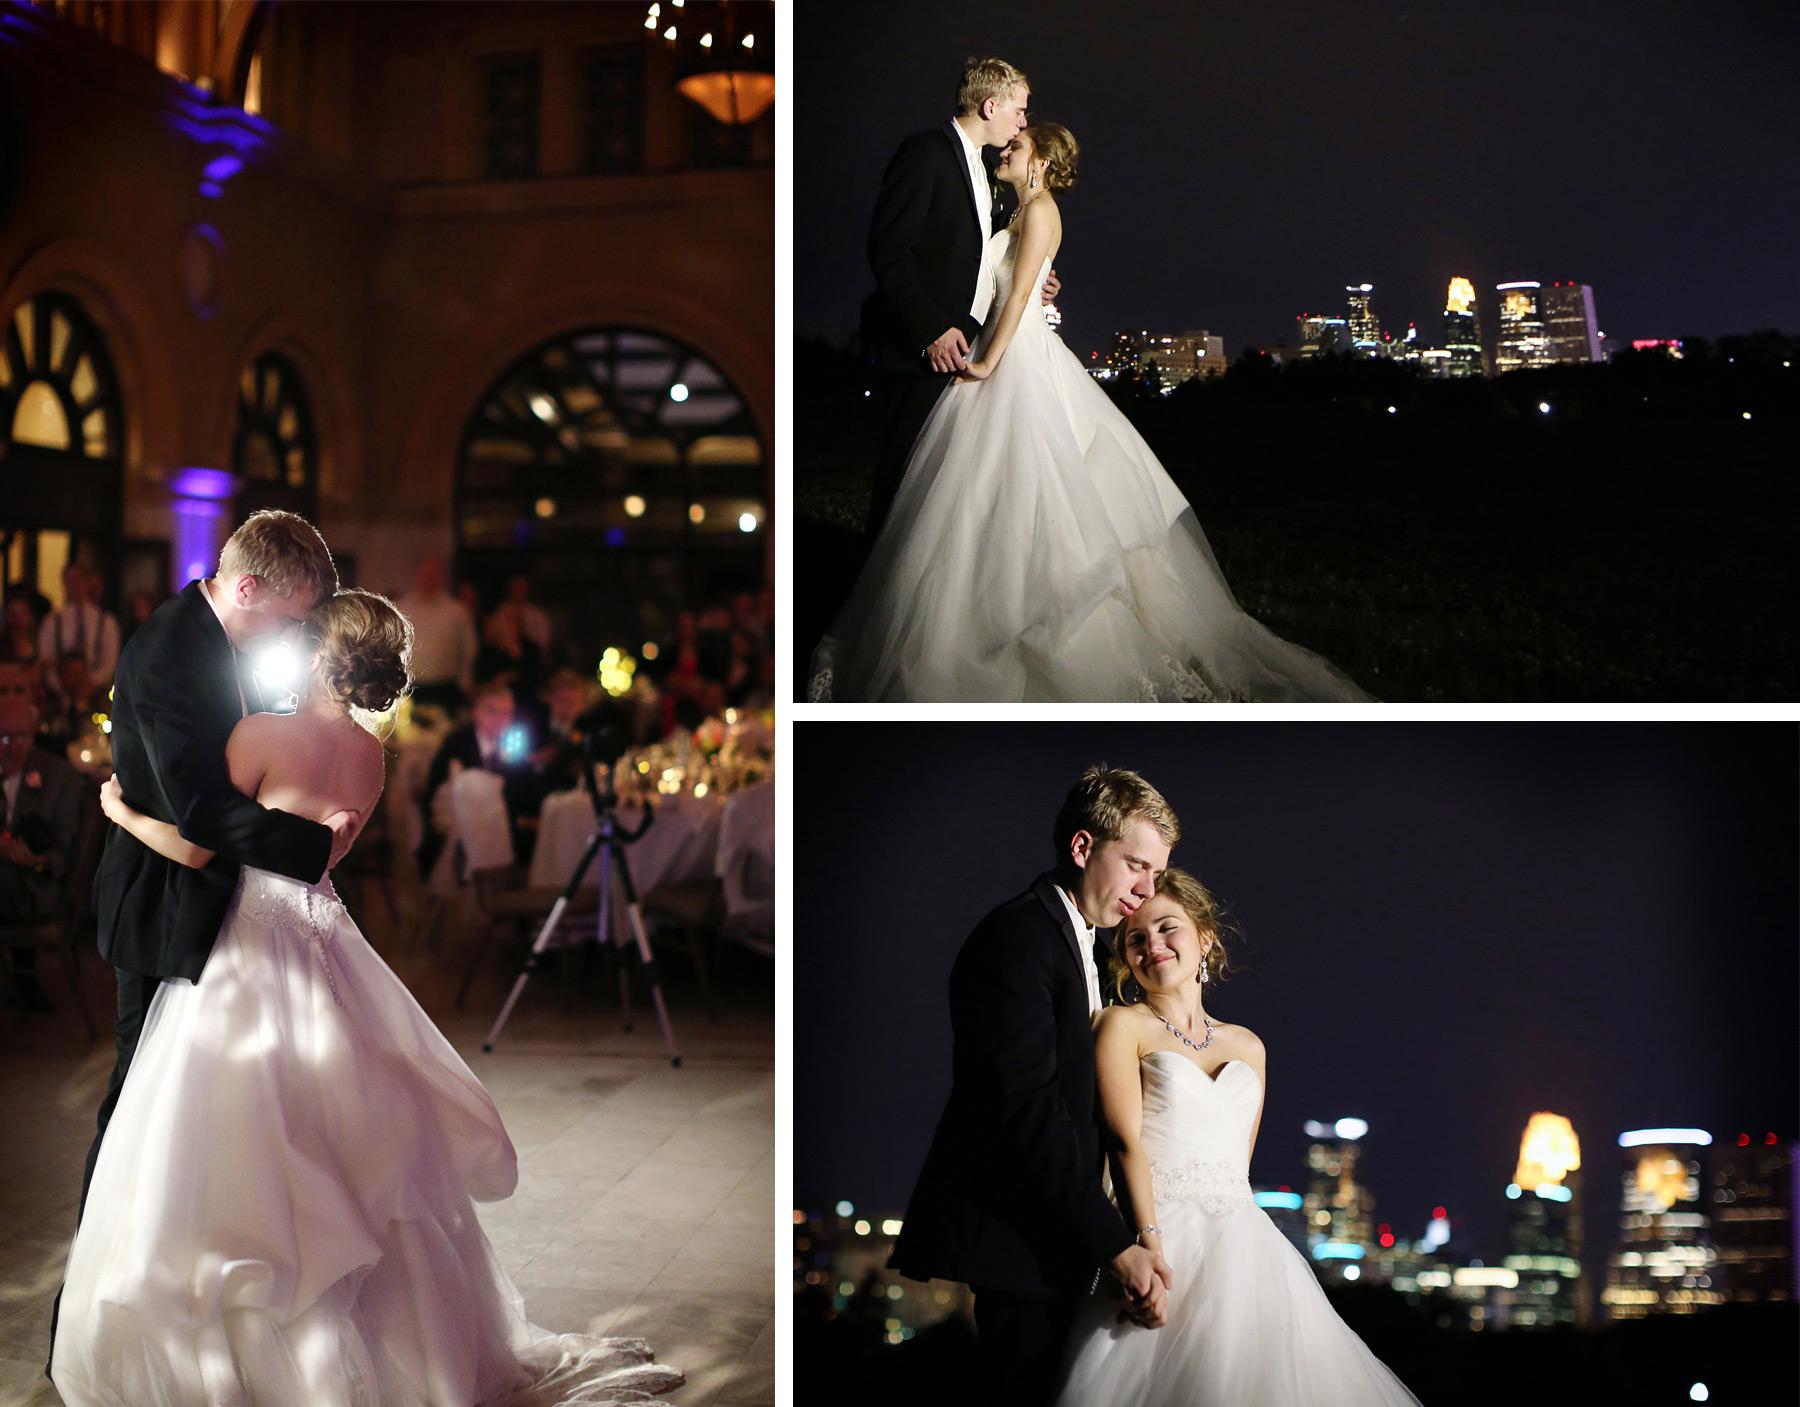 16-Minneapolis-Minnesota-Wedding-Photography-by-Vick-Photography-The-Depot-Reception-Dance-Skyline-Courtney-&-John.jpg